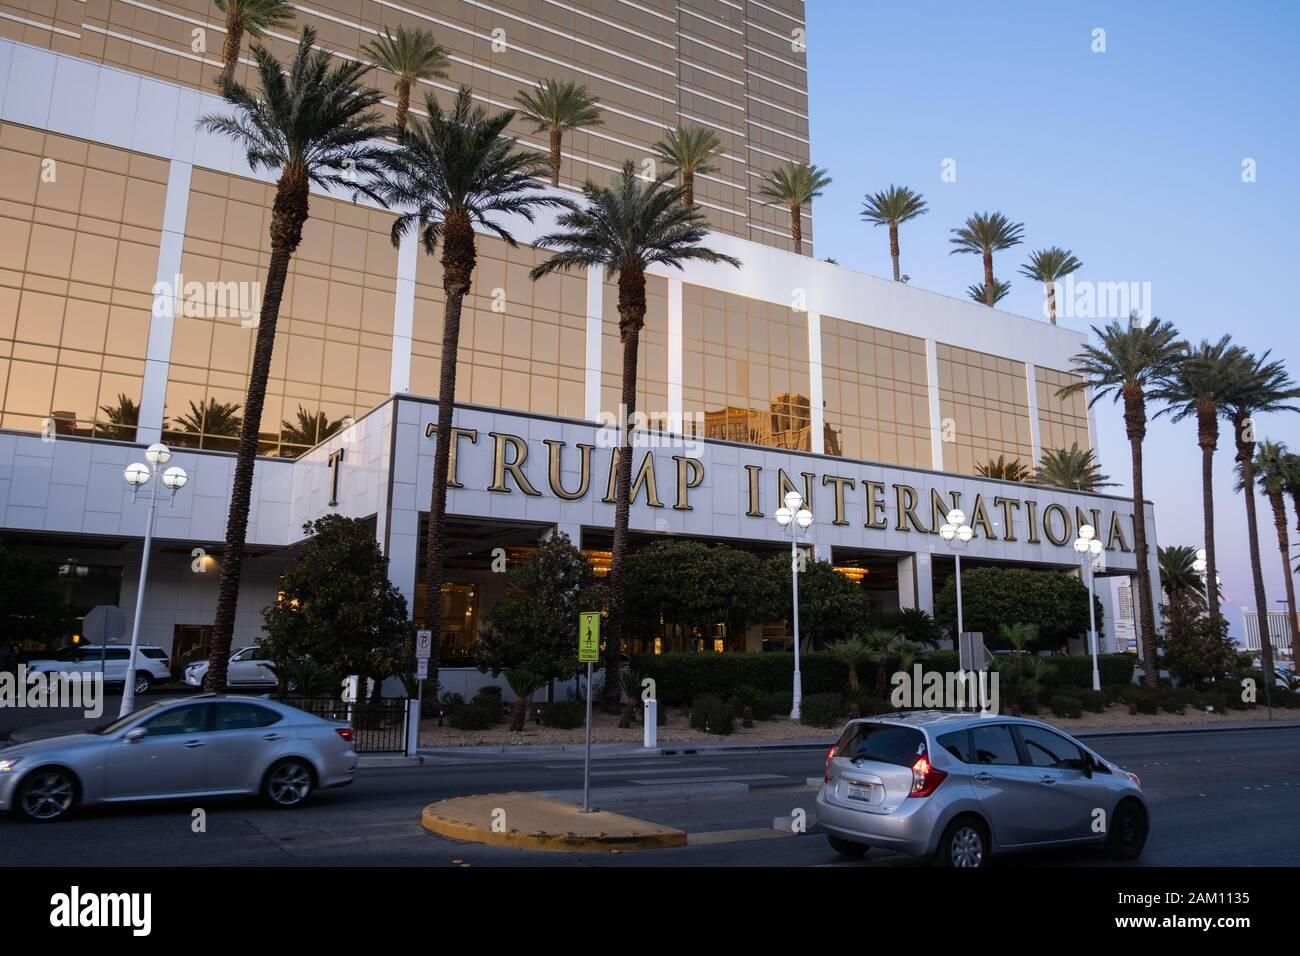 LAS VEGAS, USA - NOVEMBER 26: International Trump Tower hotel in Las Vegas on November 26, 2019 in Las Vegas, USA. Stock Photo